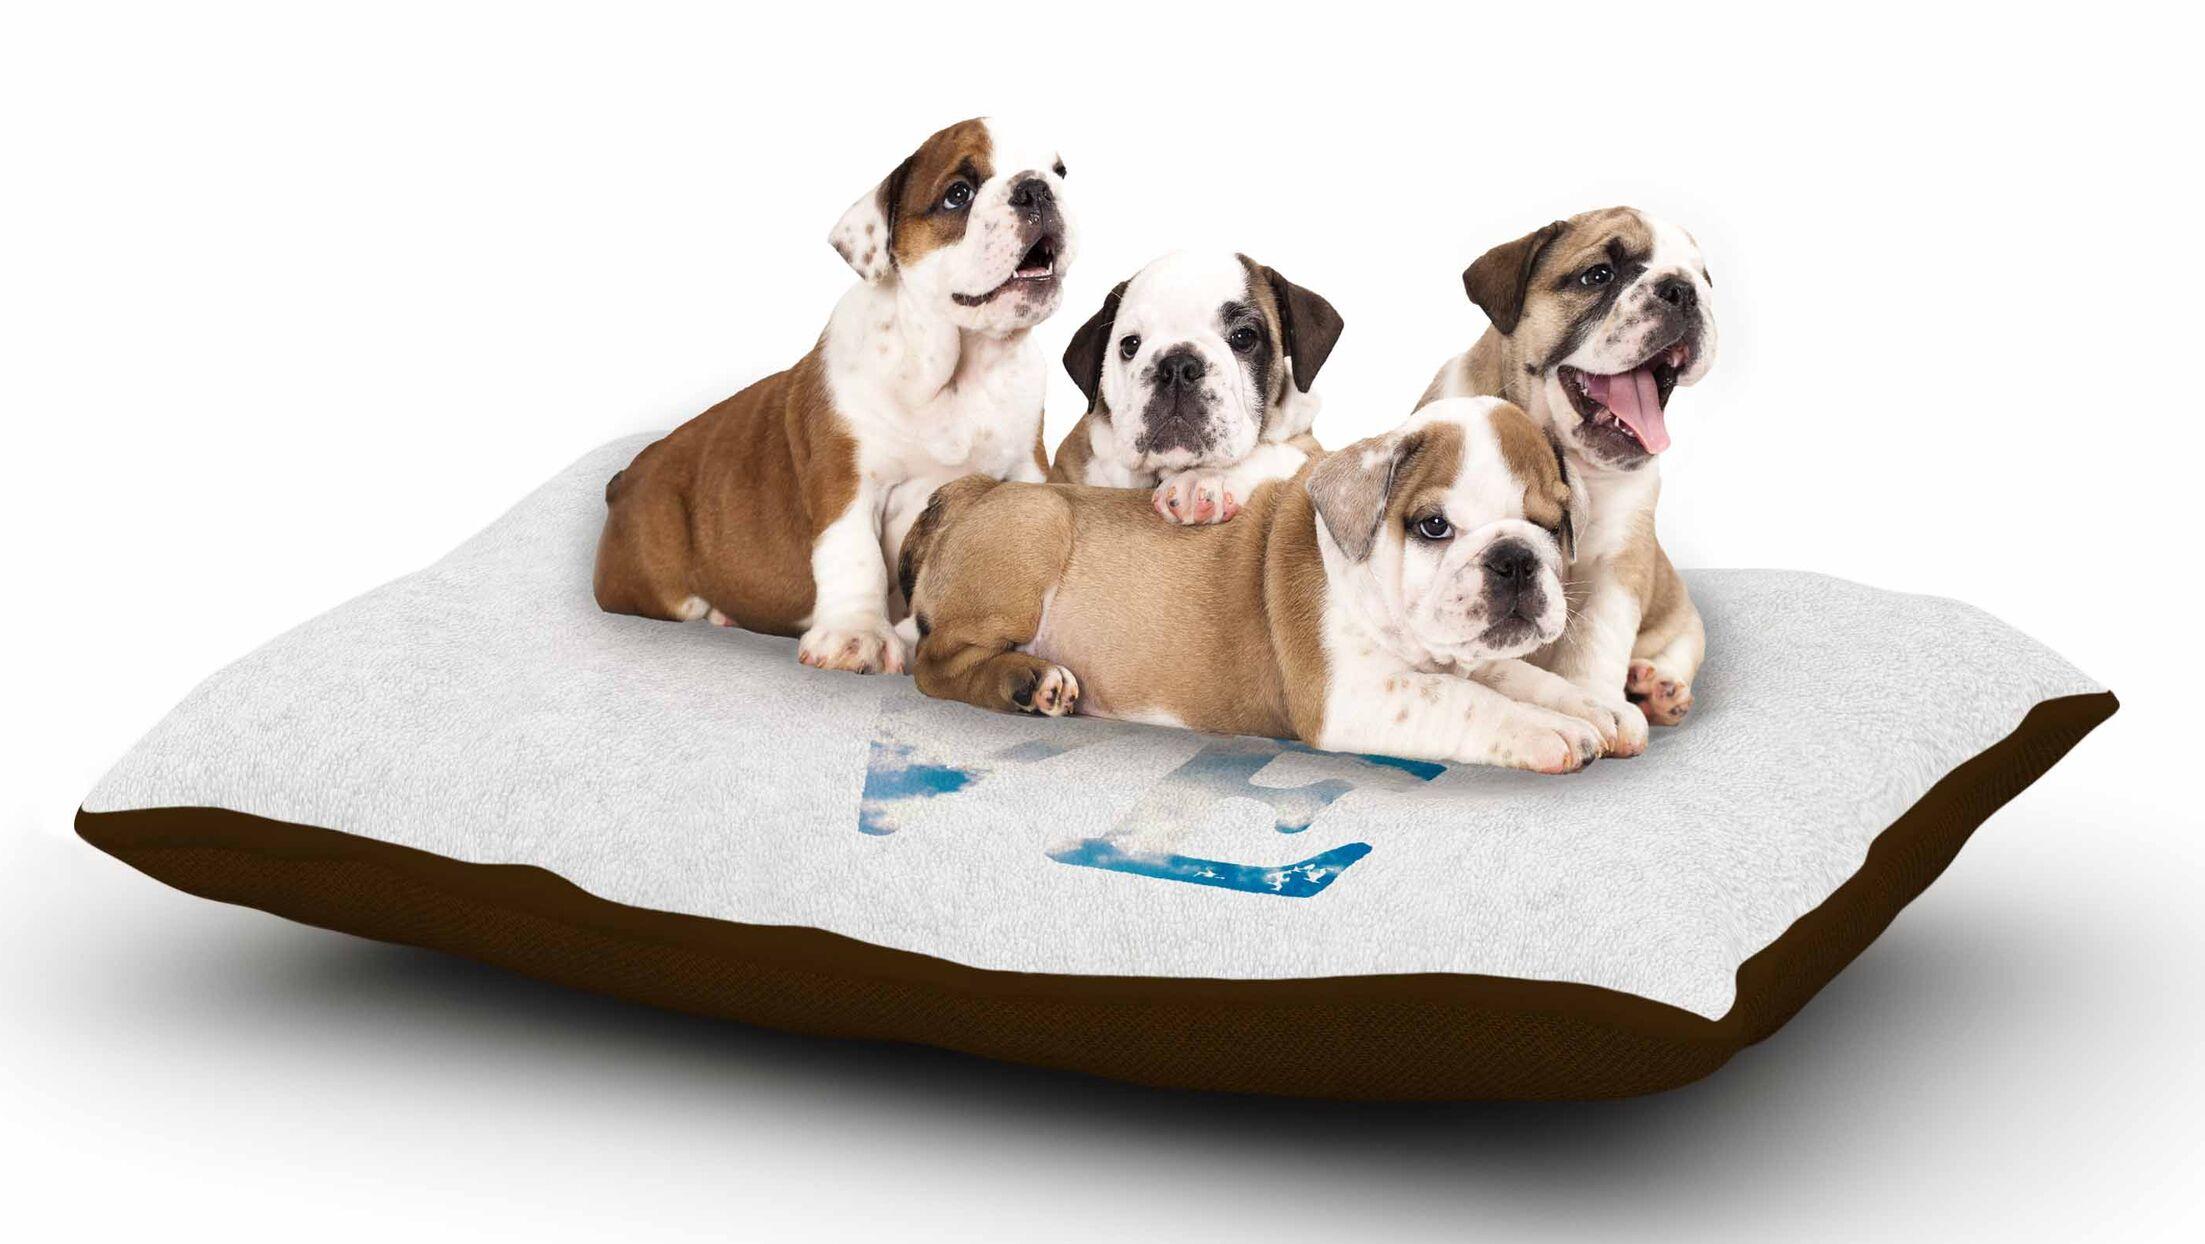 Robin Dickinson 'Love' Cloud Dog Pillow with Fleece Cozy Top